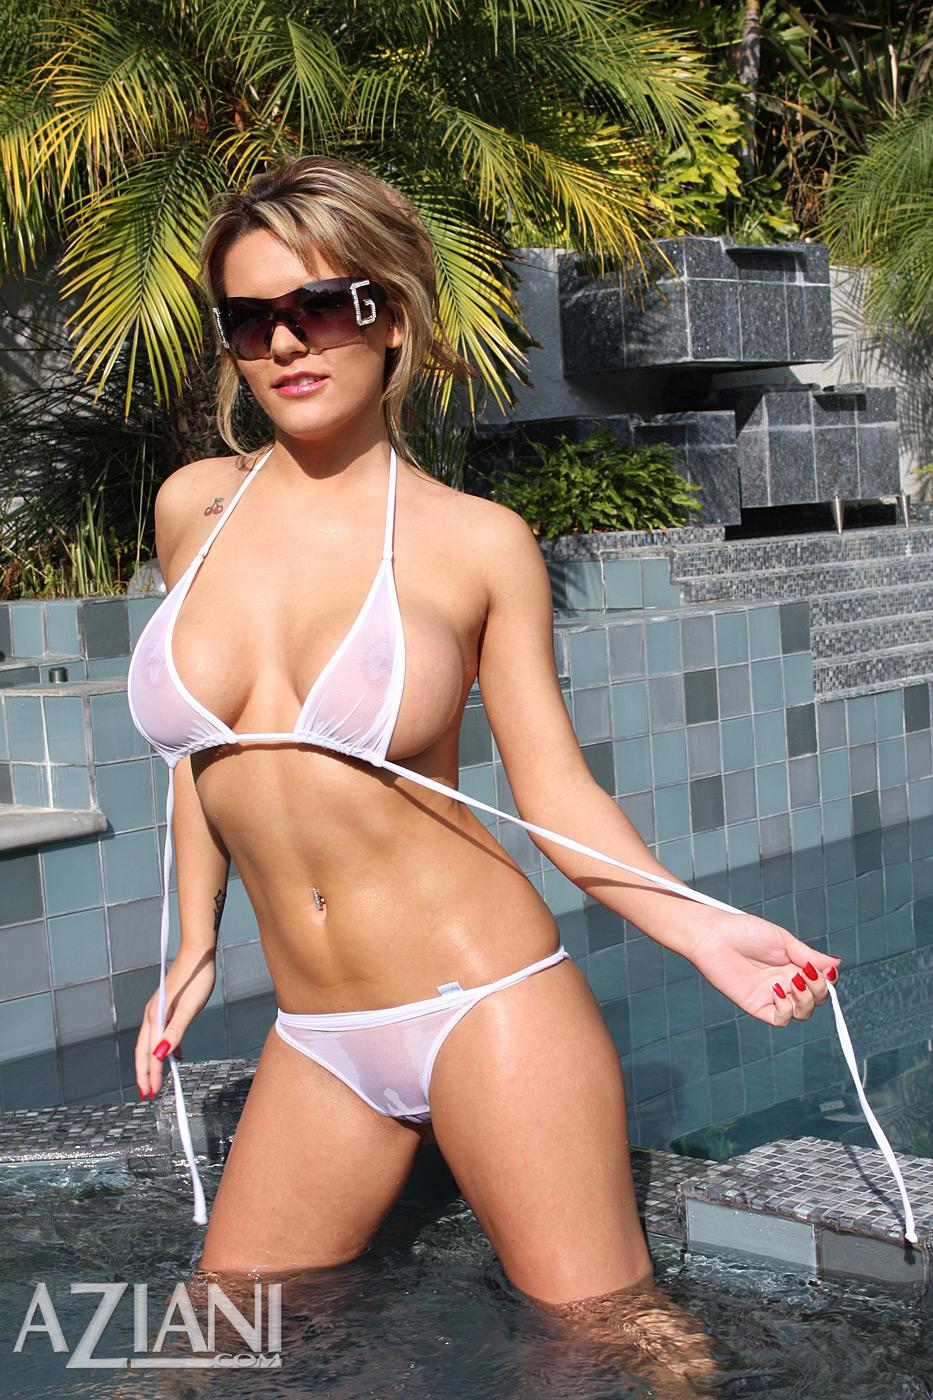 String itsy bitsy myself fabulous: bikini